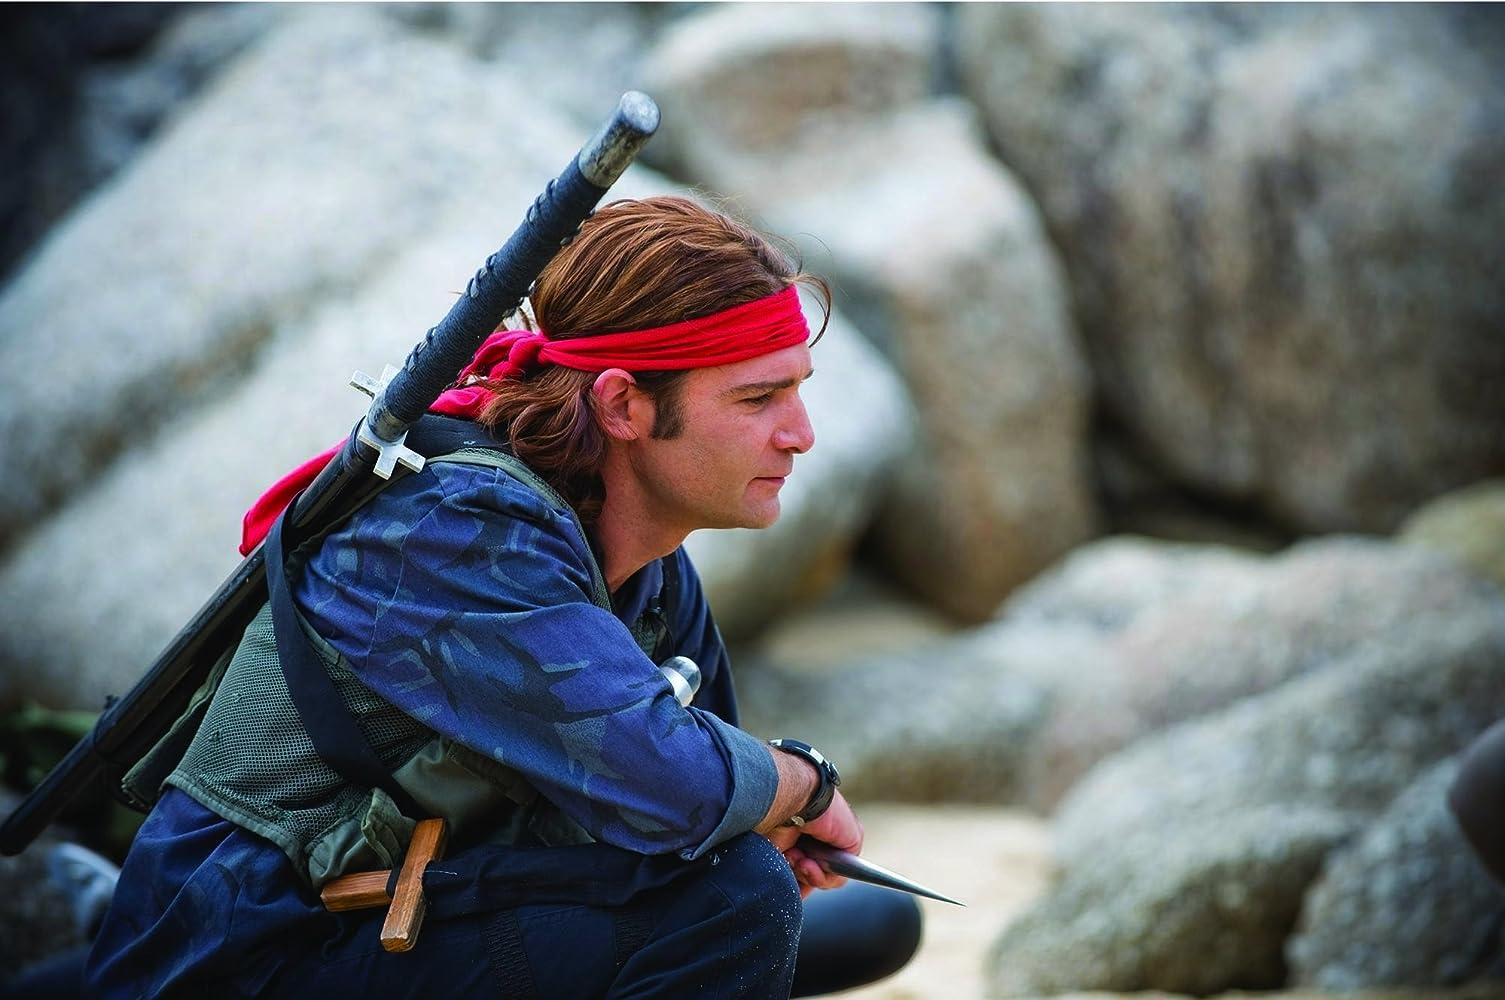 Corey Feldman in Lost Boys: The Thirst (2010)